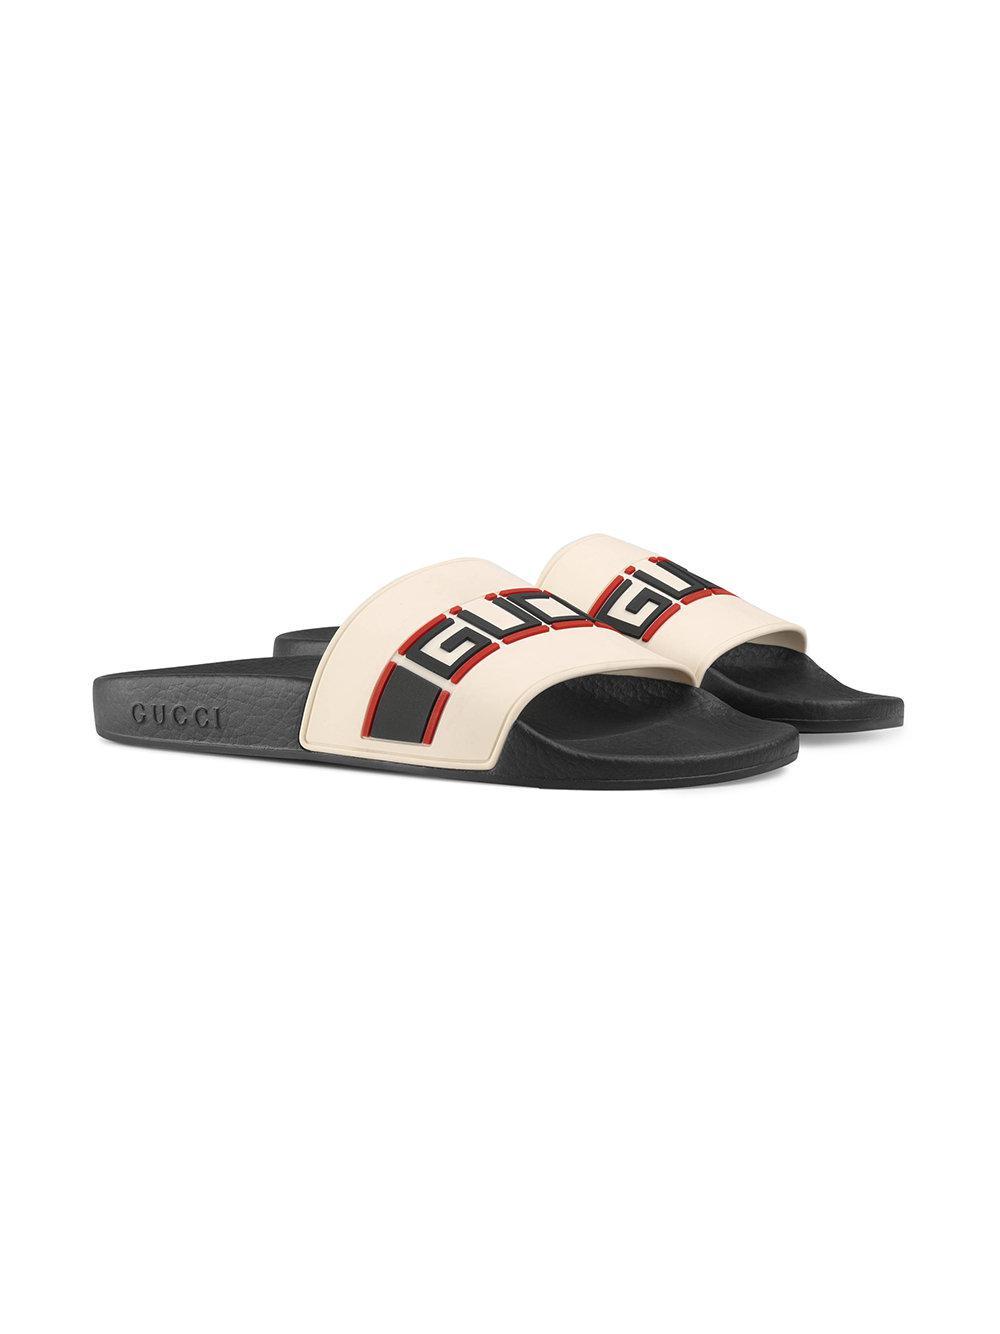 a28d75227825 Lyst - Gucci Stripe Rubber Slide Sandals in White - Save 14%